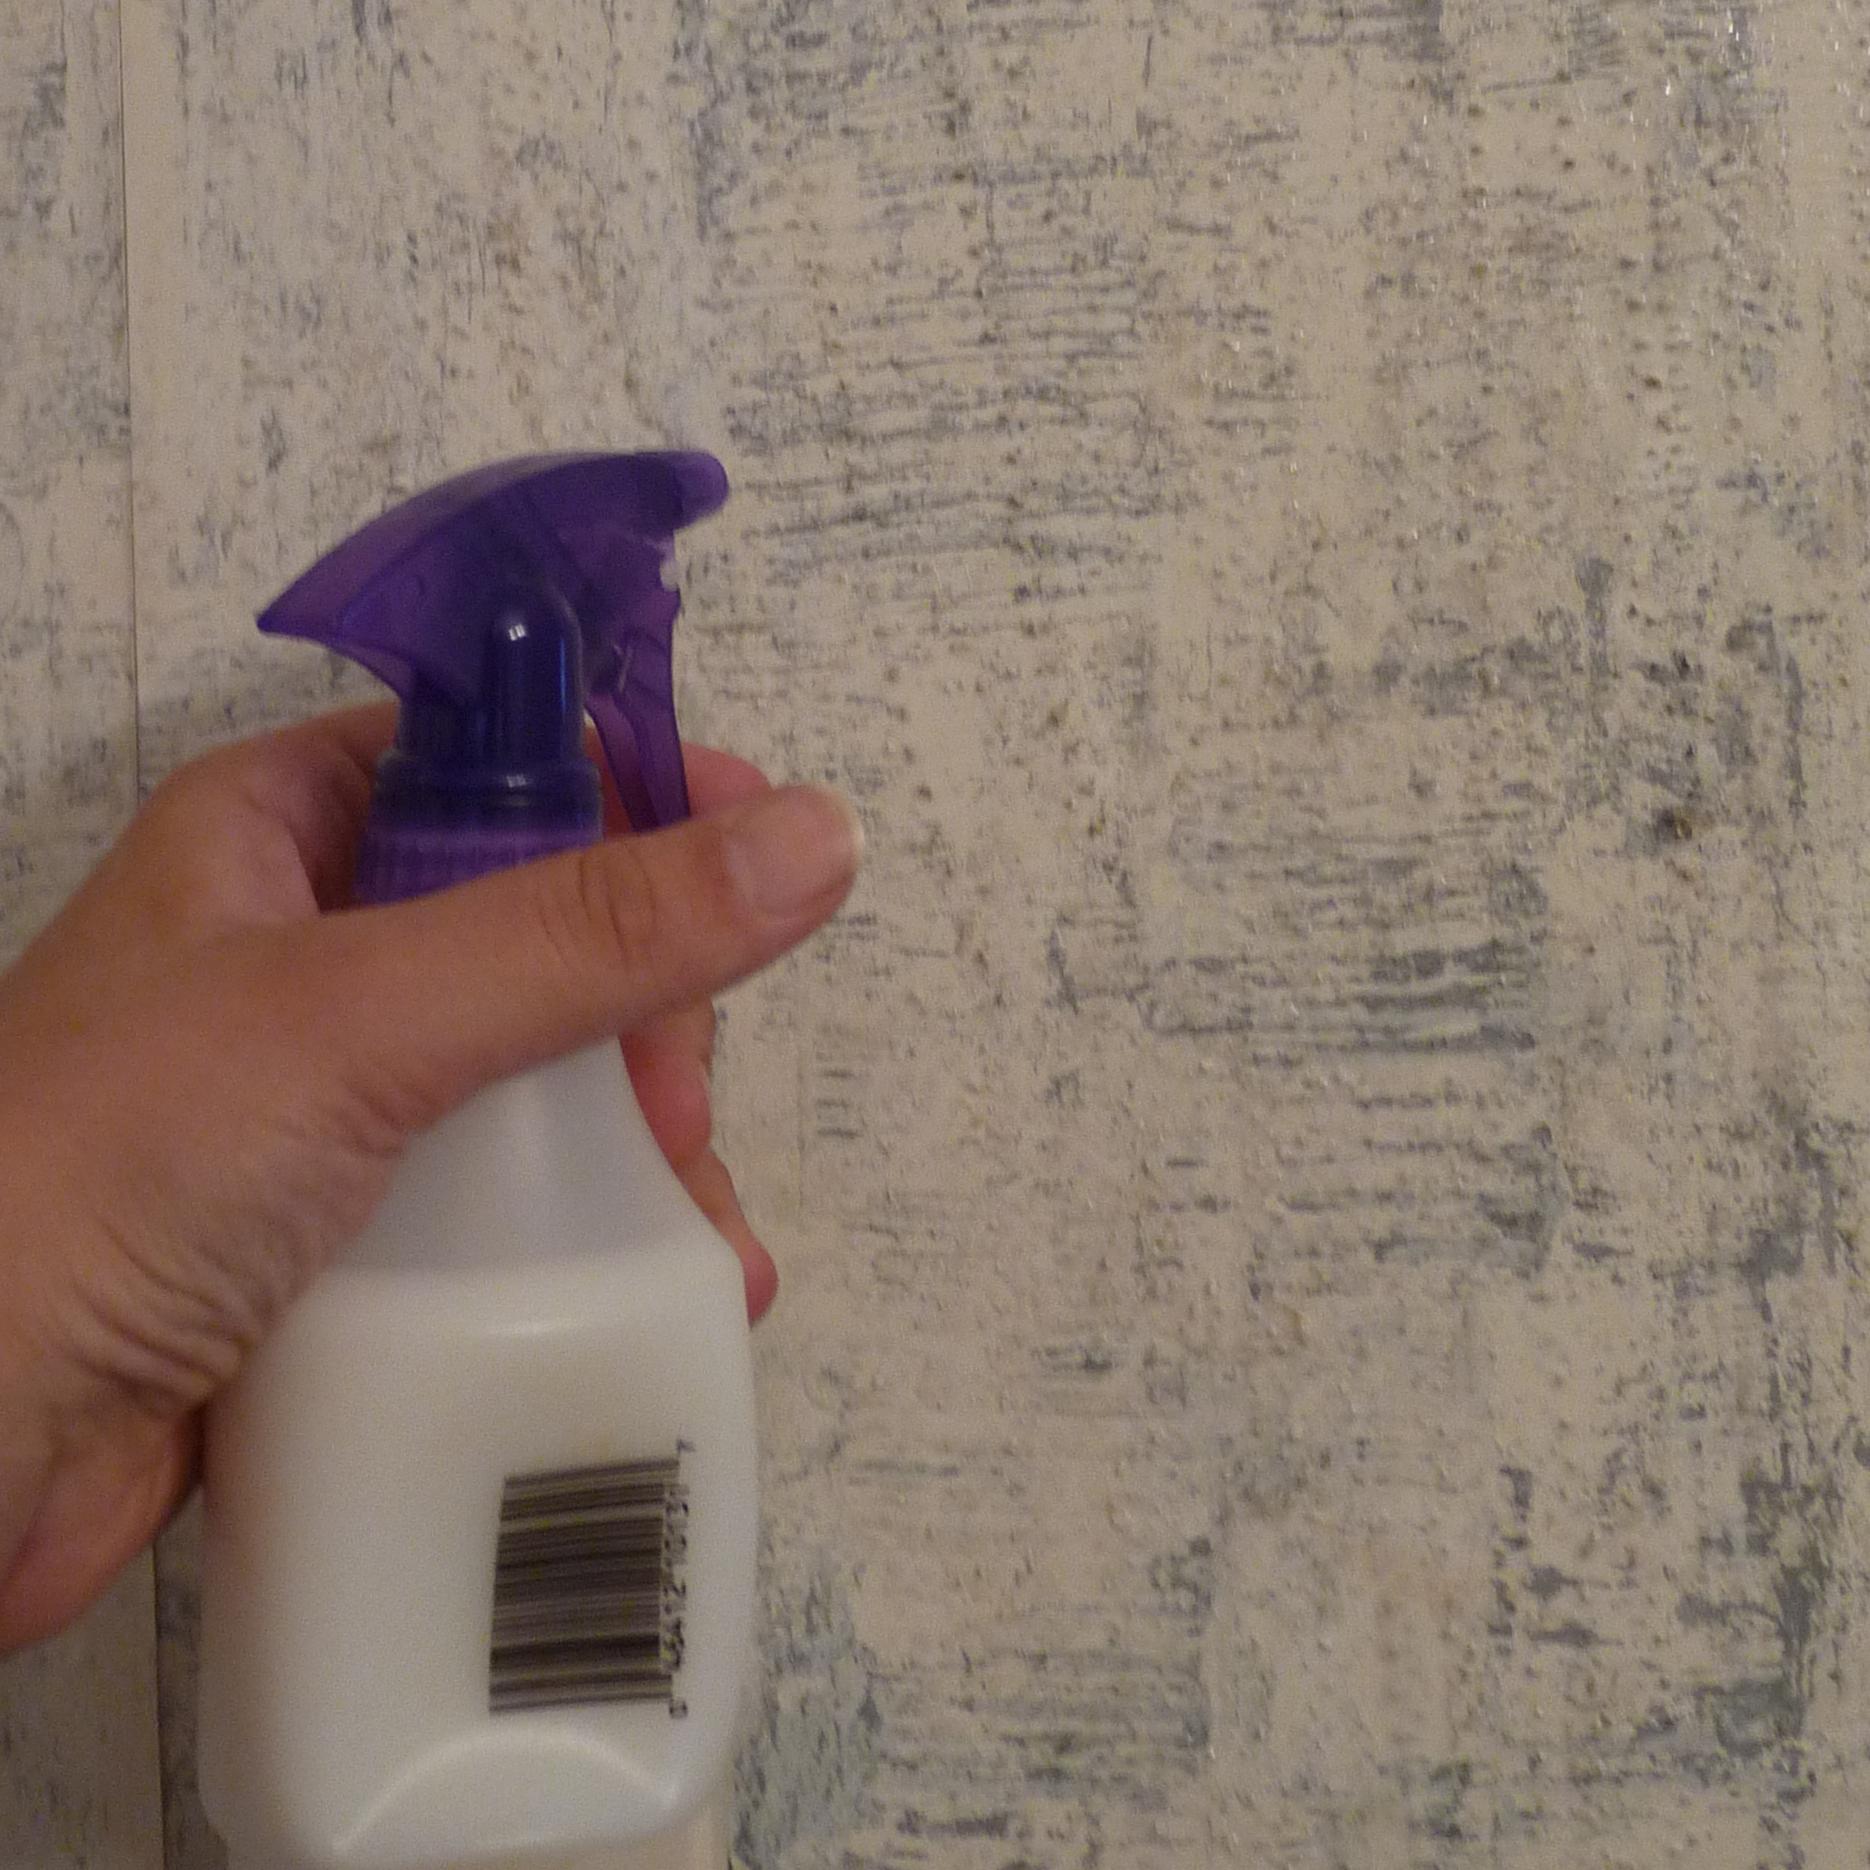 Fabric Wallpaper Fabric Softener Wallpaper Removal 1870x1870